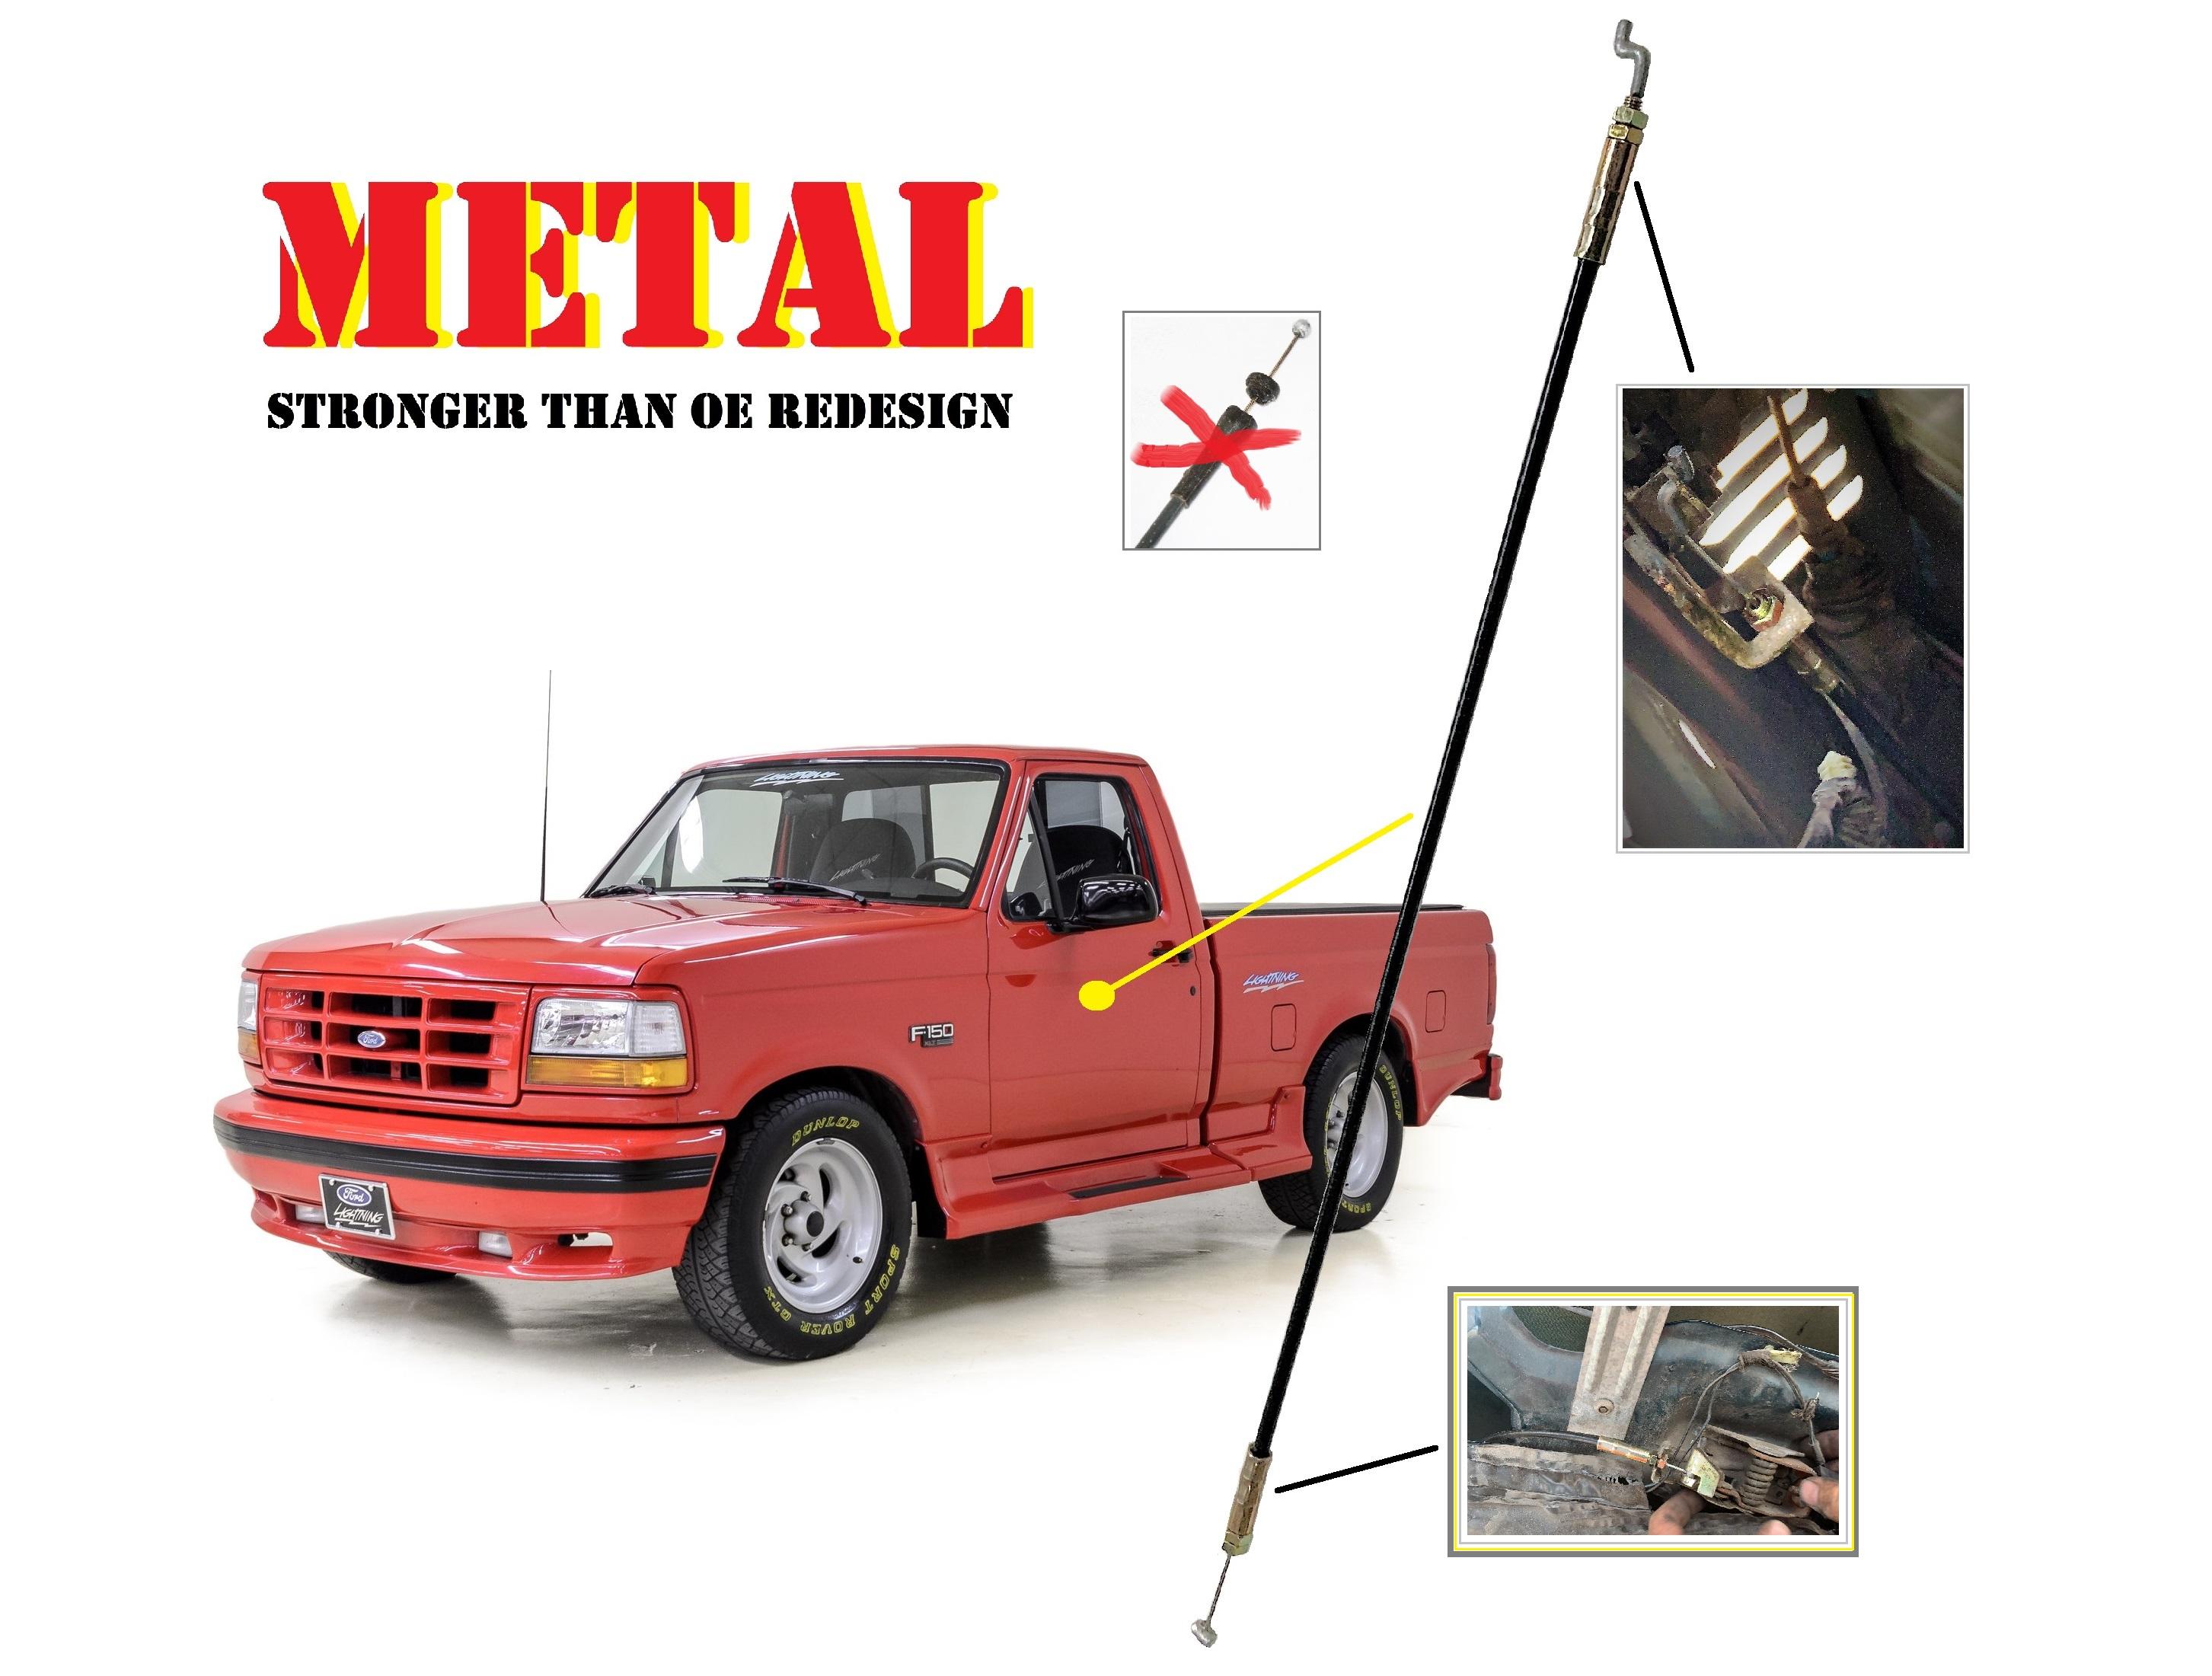 New Distributor For Ford 4.9 Straight 6 1992-1996 F150 F-250 E-150 E-250 Bronco